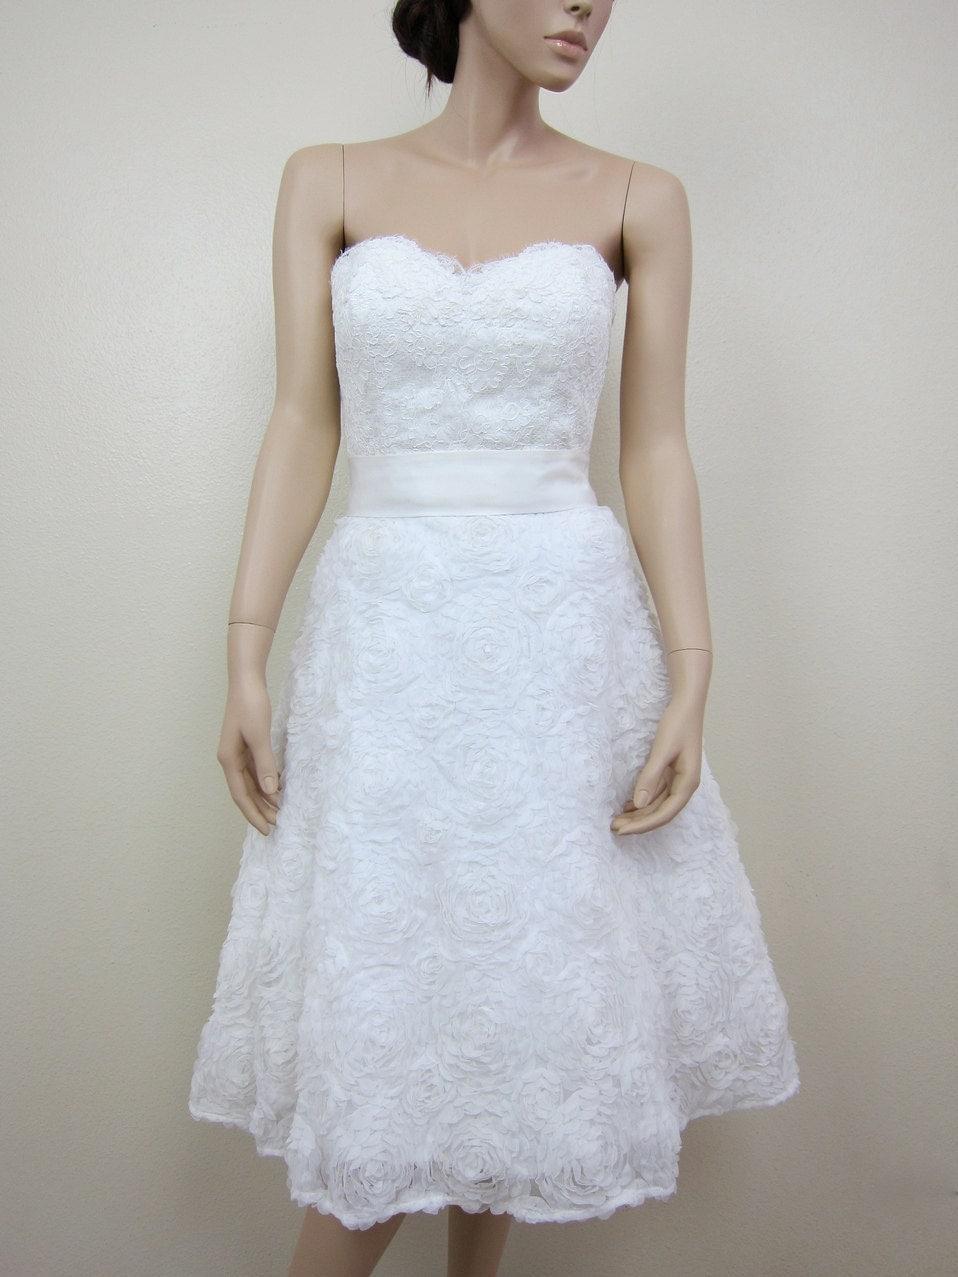 Ivory strapless tea length wedding dress alencon by alexbridal for Ivory tea length wedding dress